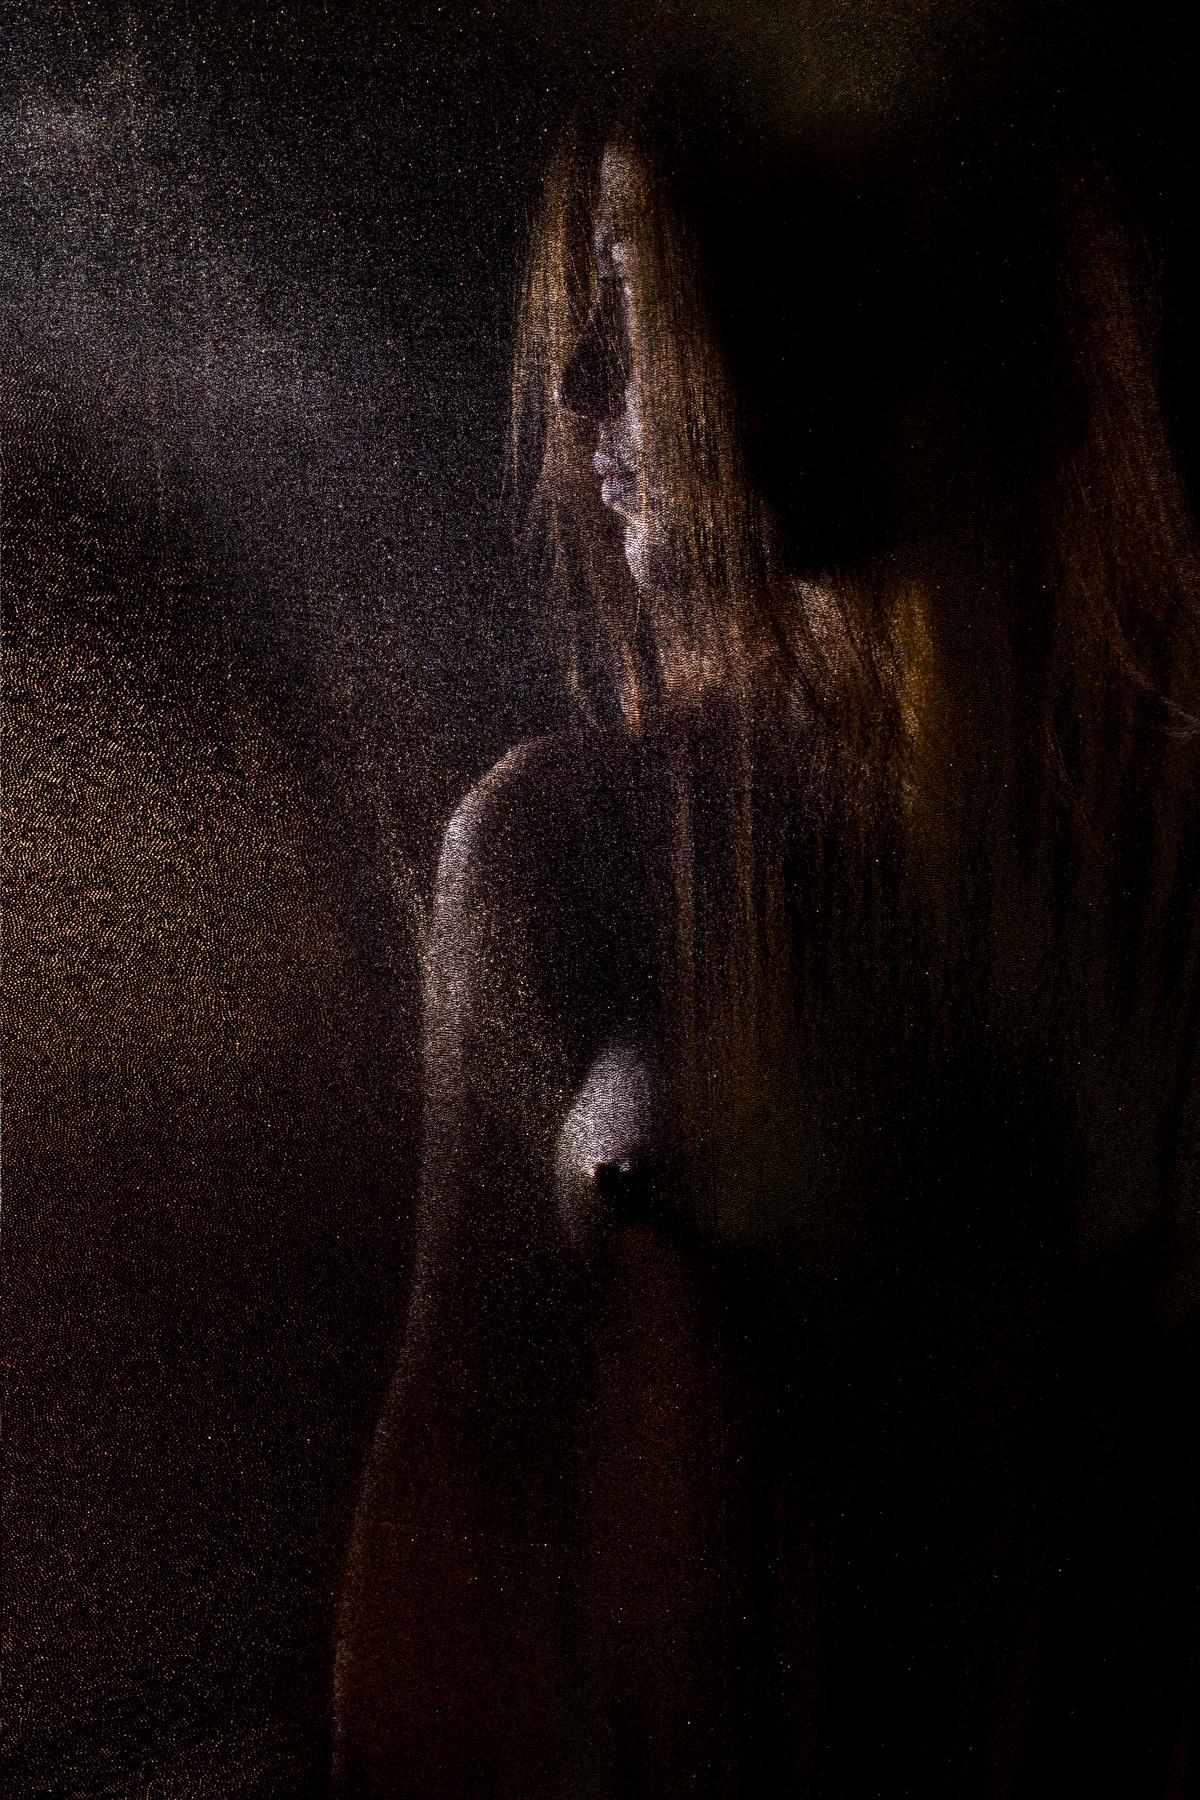 Ursula_Lelen_Beyond Limits_On the Edge_1.jpg